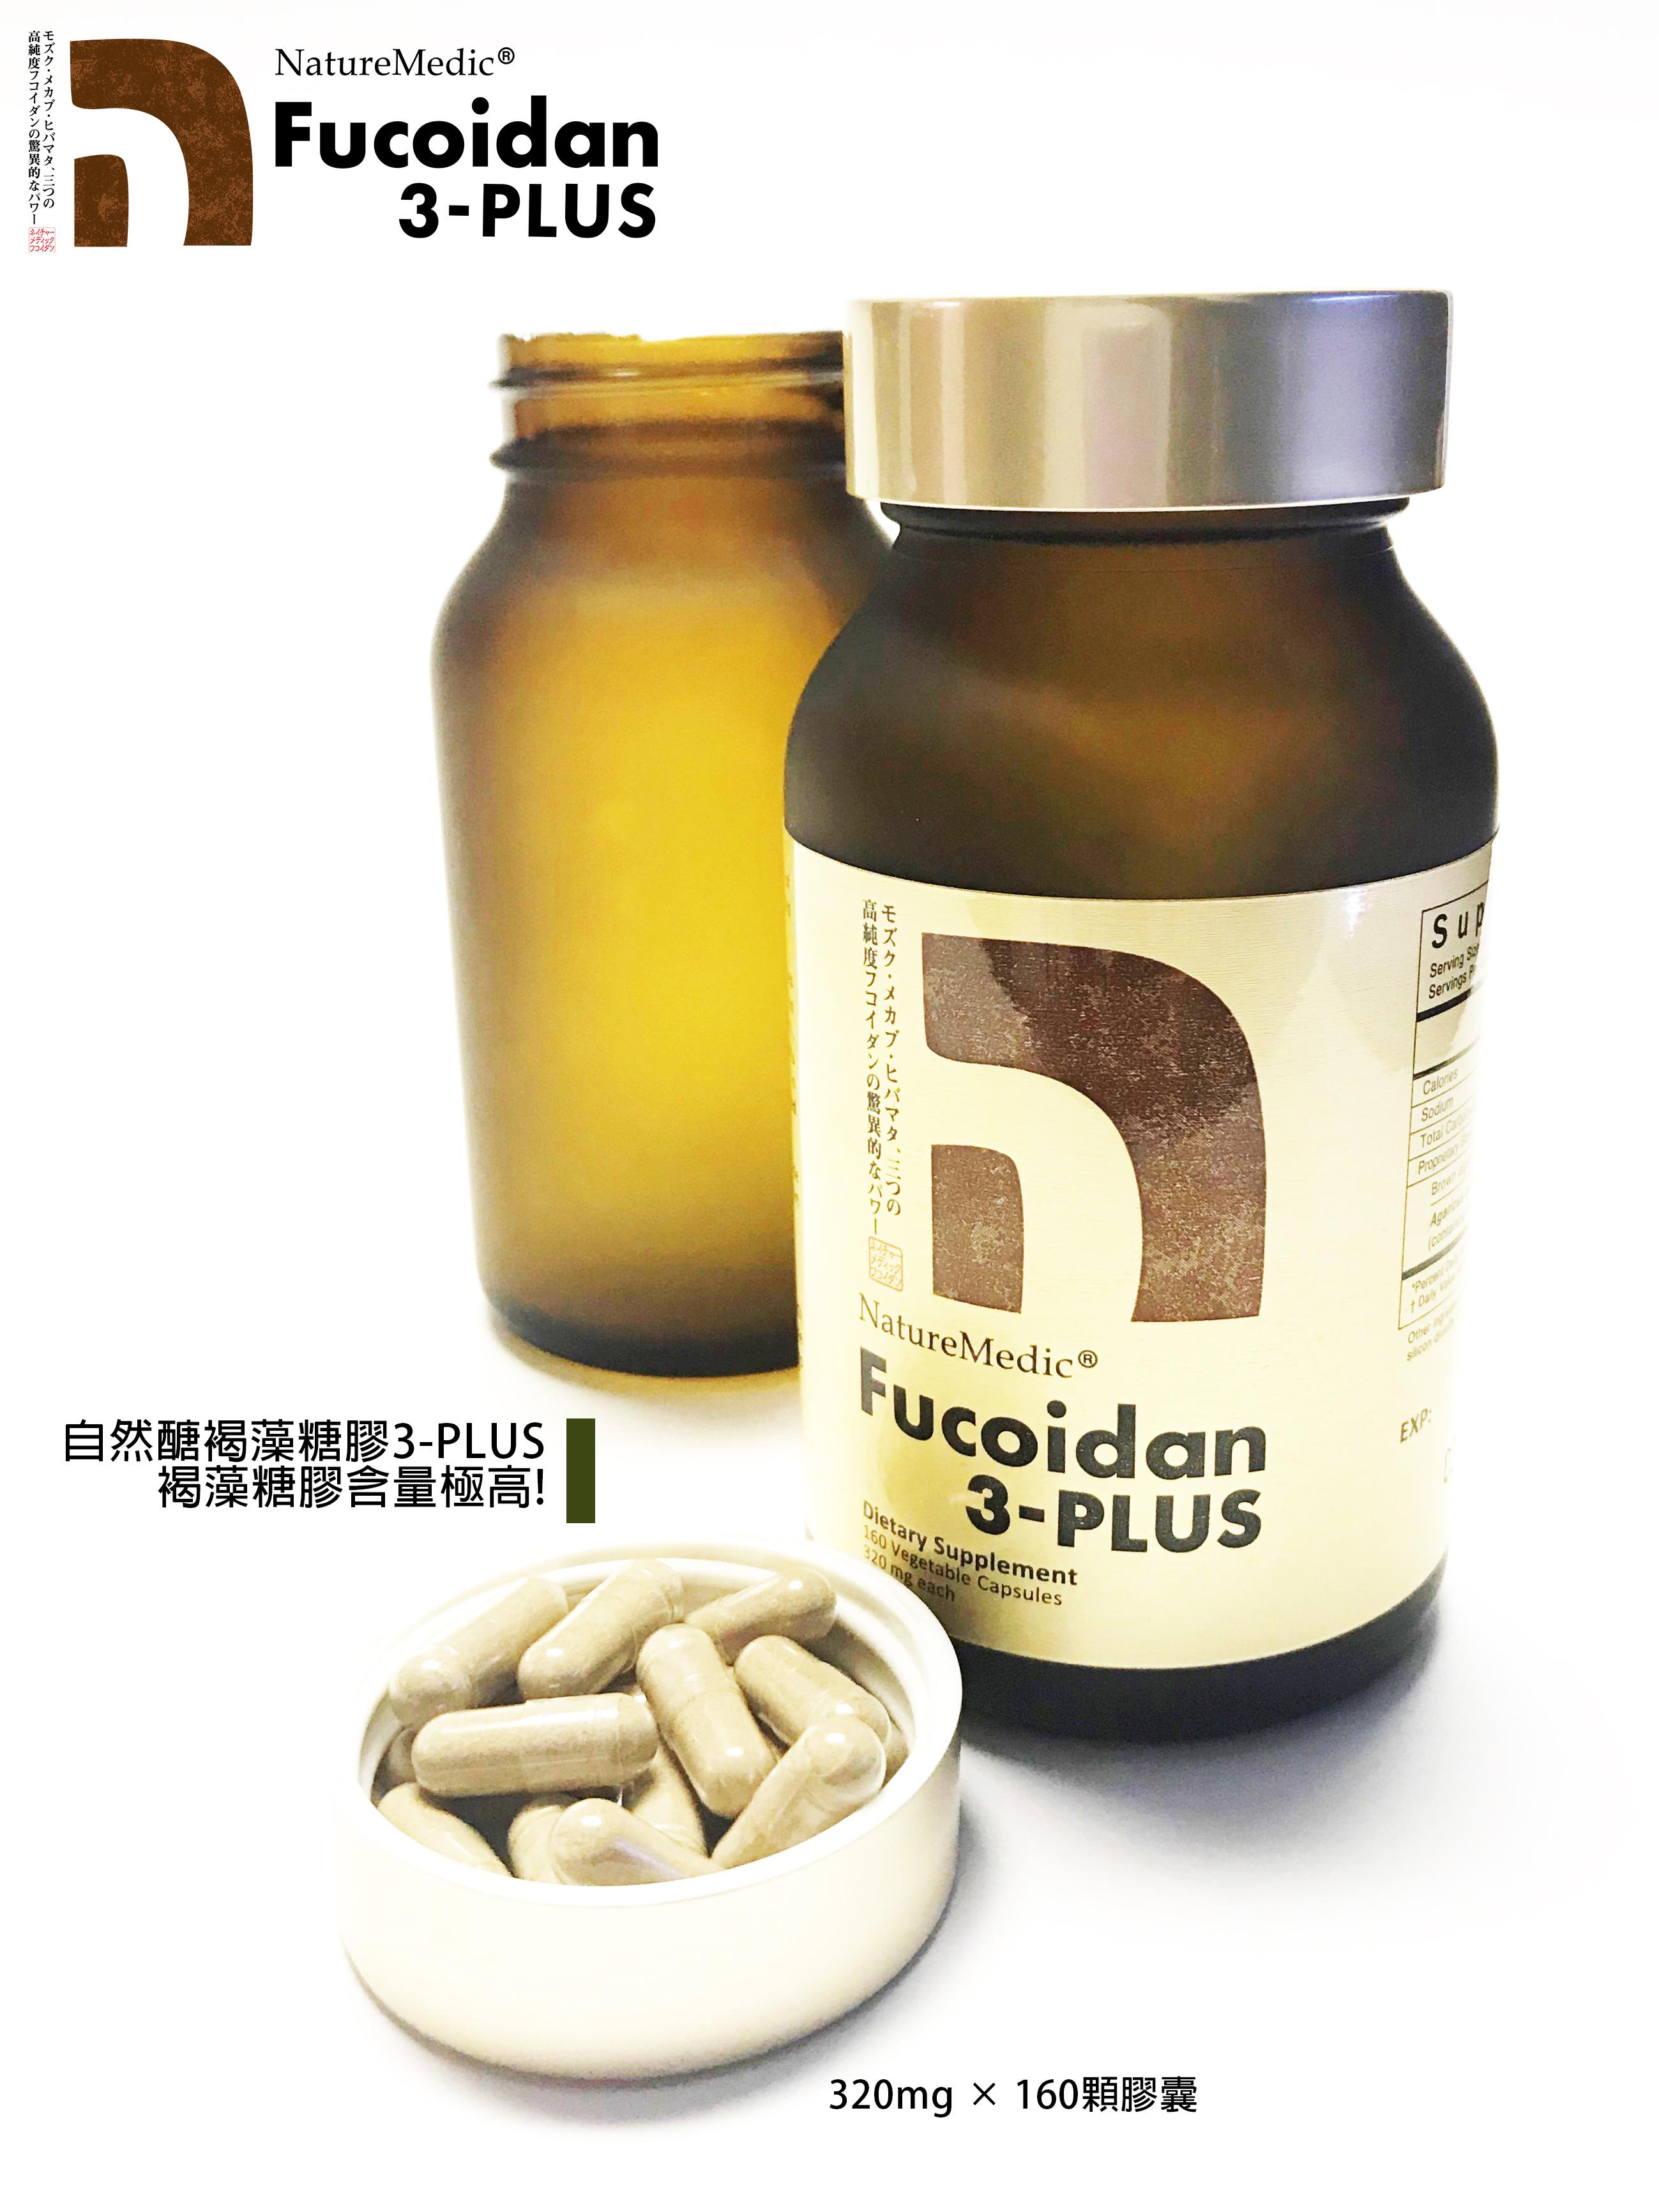 3-Plus Fucoidan-12